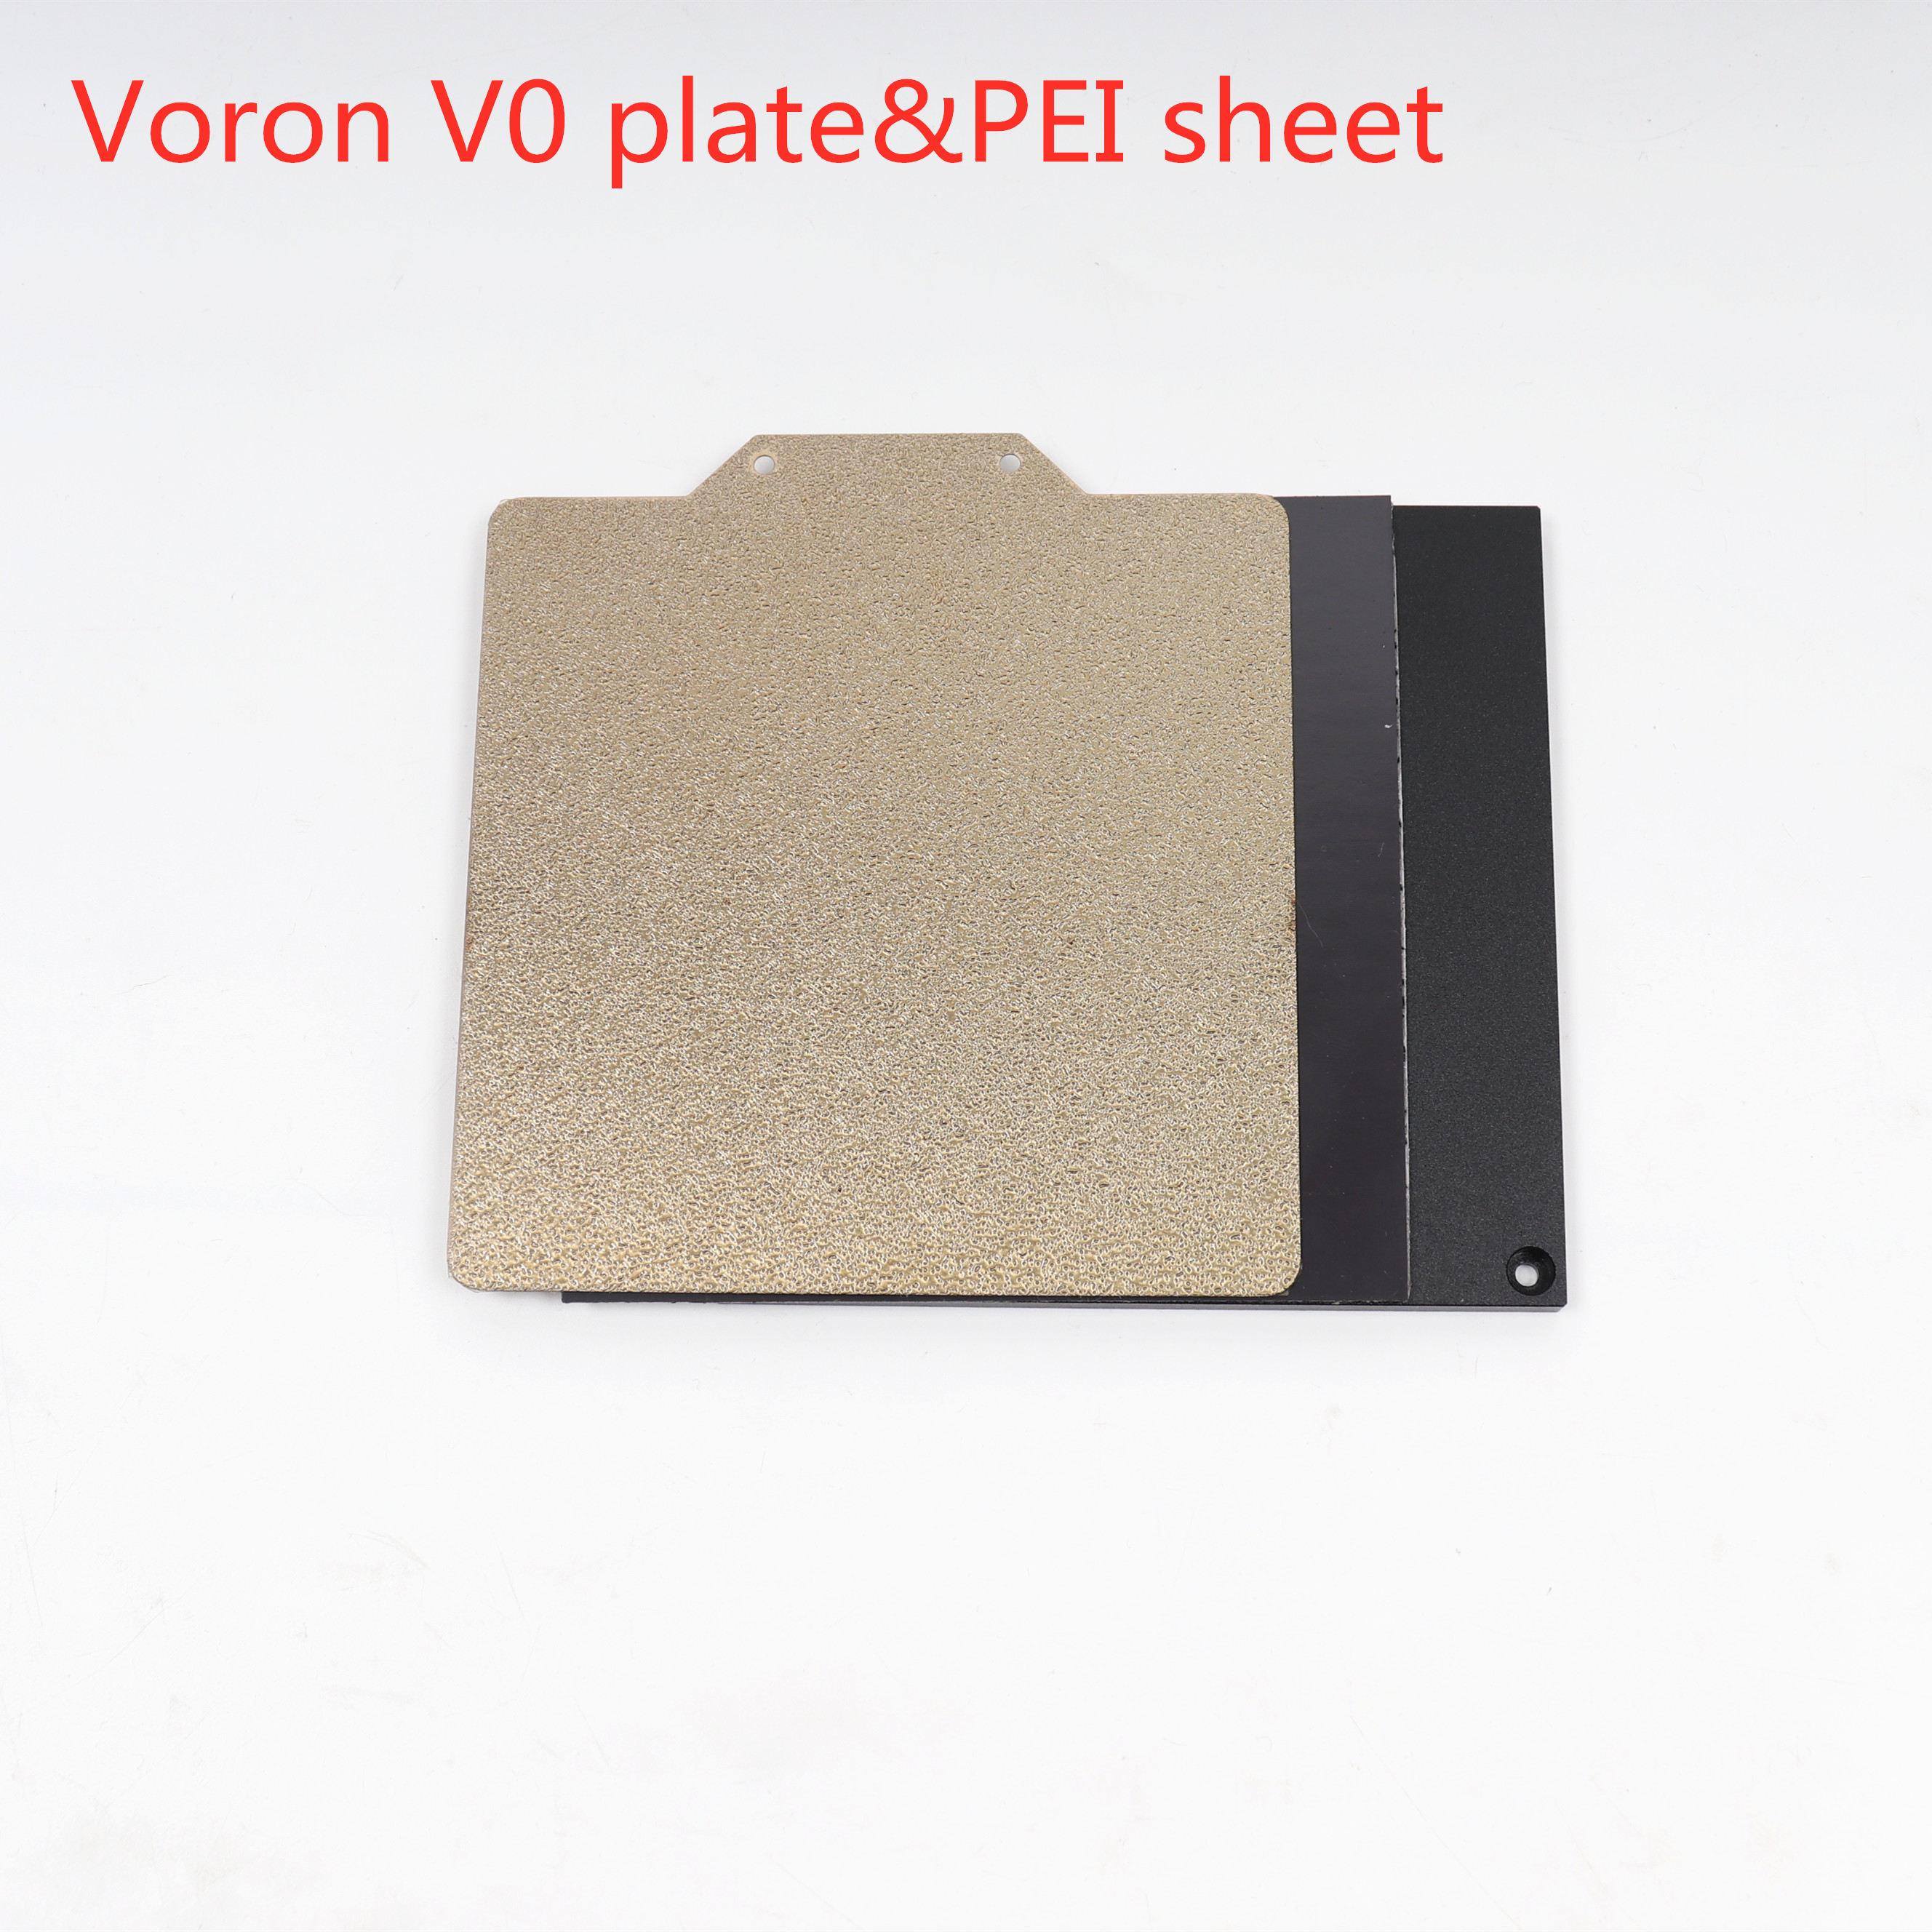 Voron V0 impresora 3d placa de aluminio anodizado y 120x120mm doble cara texturizada/suave hoja de acero PEI Spring